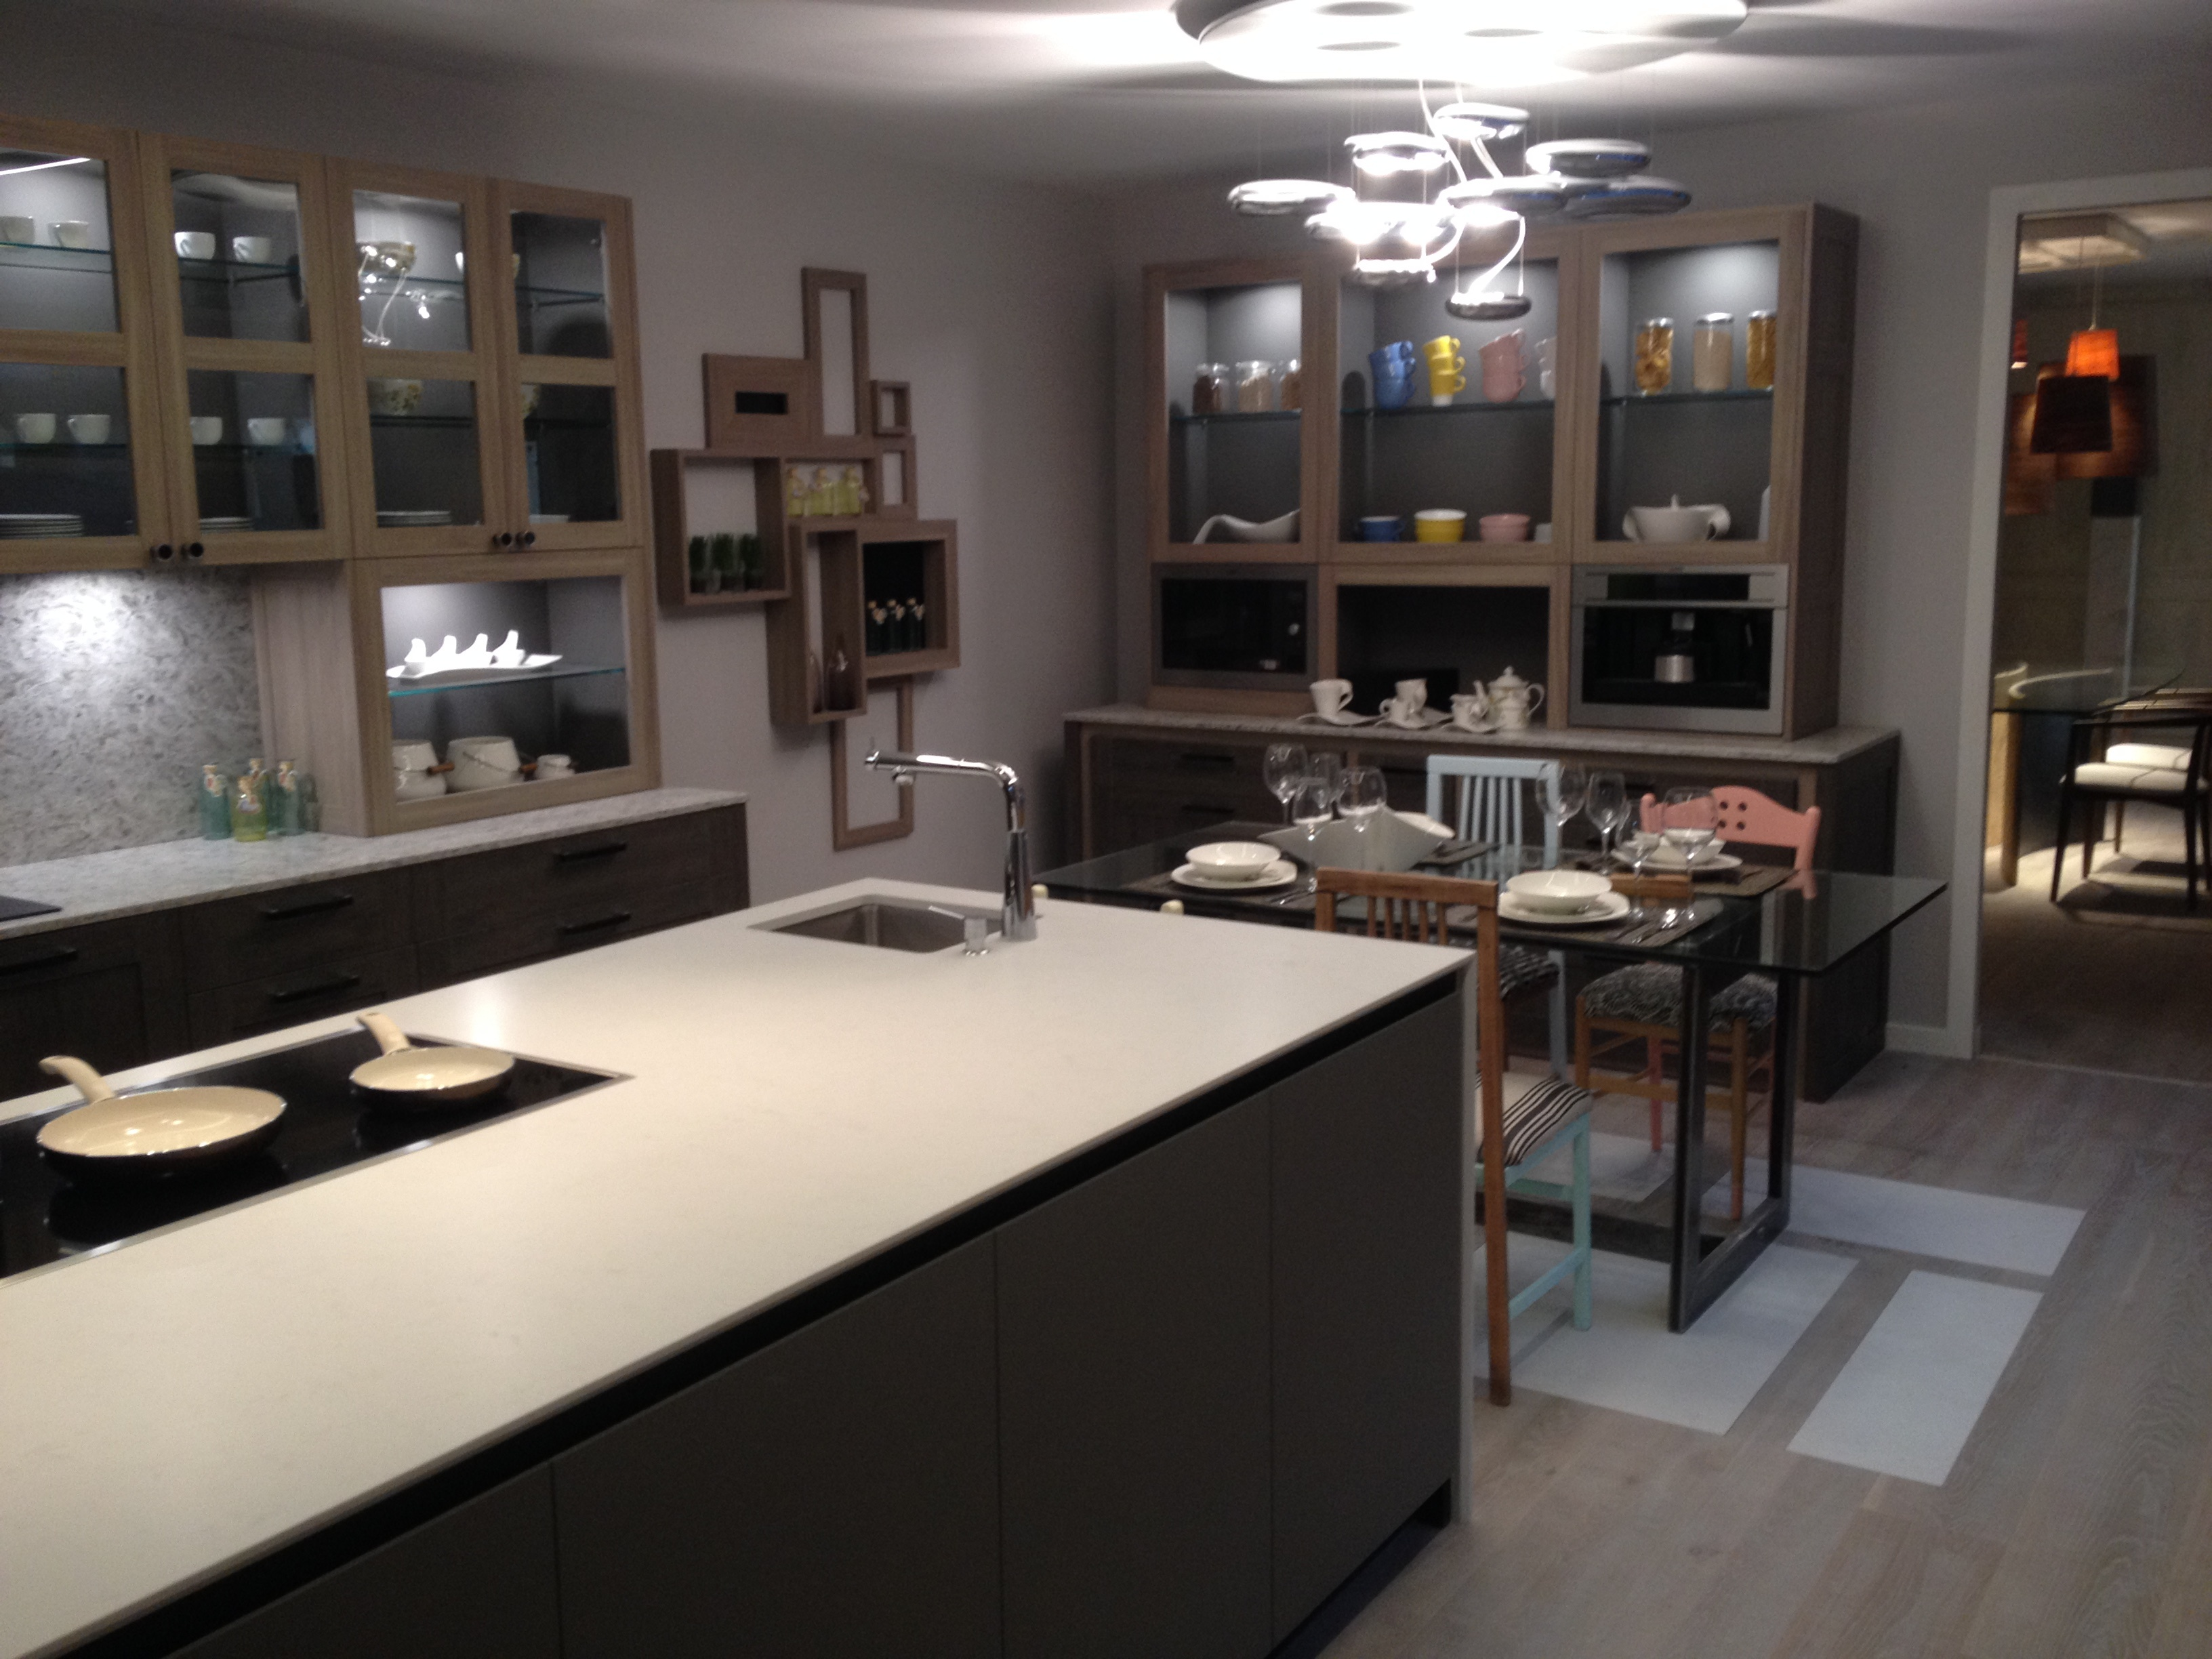 CASA DECOR 2015 II PARTE - Blogs de Línea 3 Cocinas, Diseño de ...